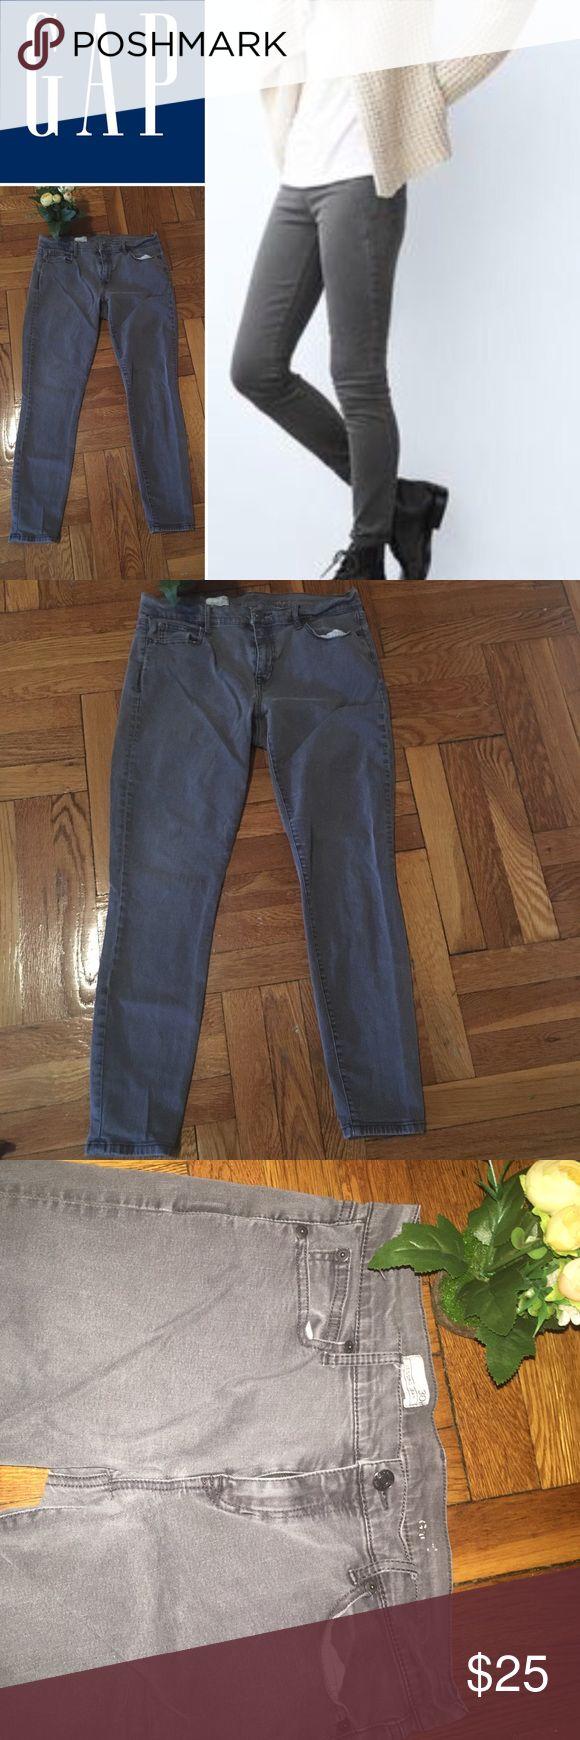 GAP- Size30R/ gray legging jeans. GAP- Size30R/ gray legging jeans. GAP Jeans Skinny